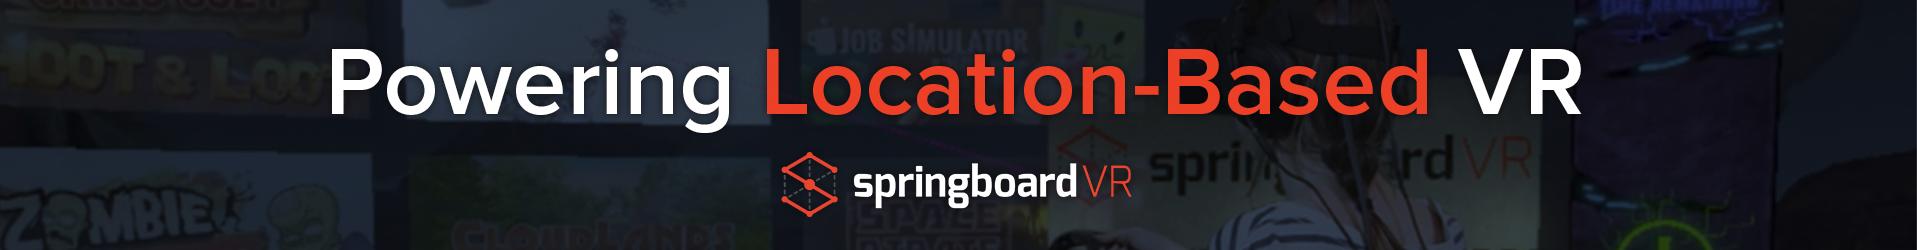 Springboard_logo-flat